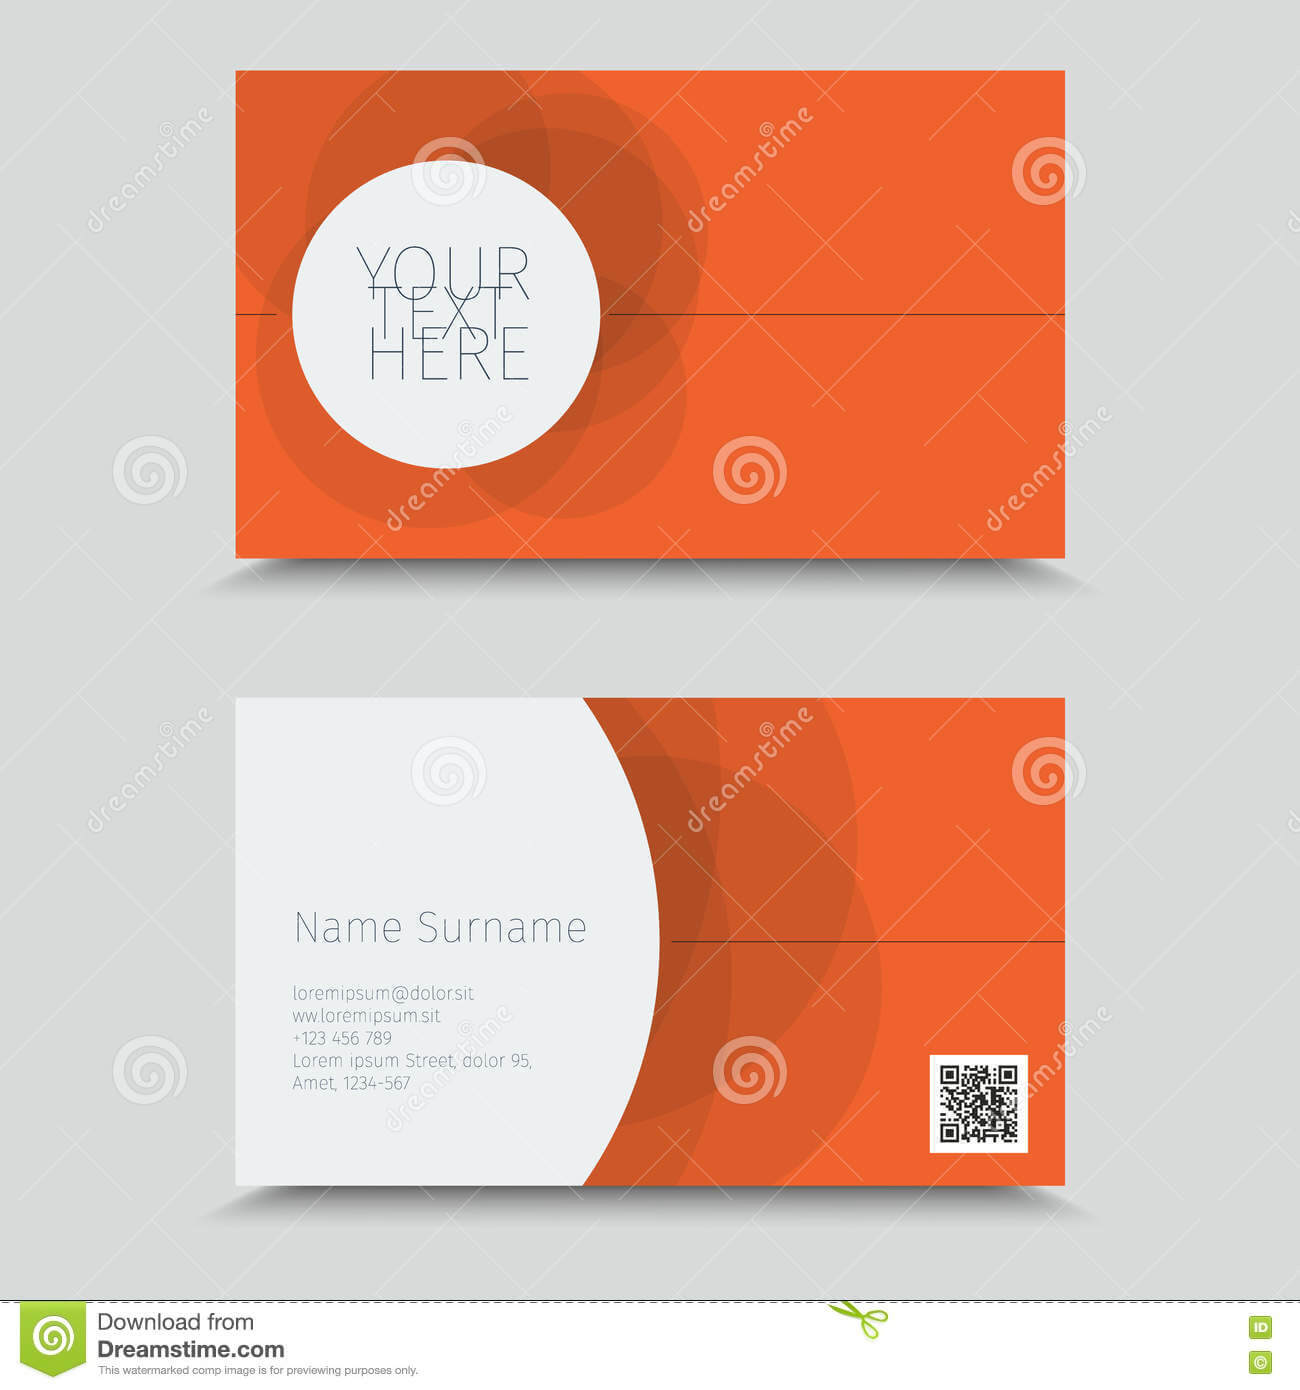 Vertor Visit Card Template Design. Stock Vector Inside Qr Code Business Card Template